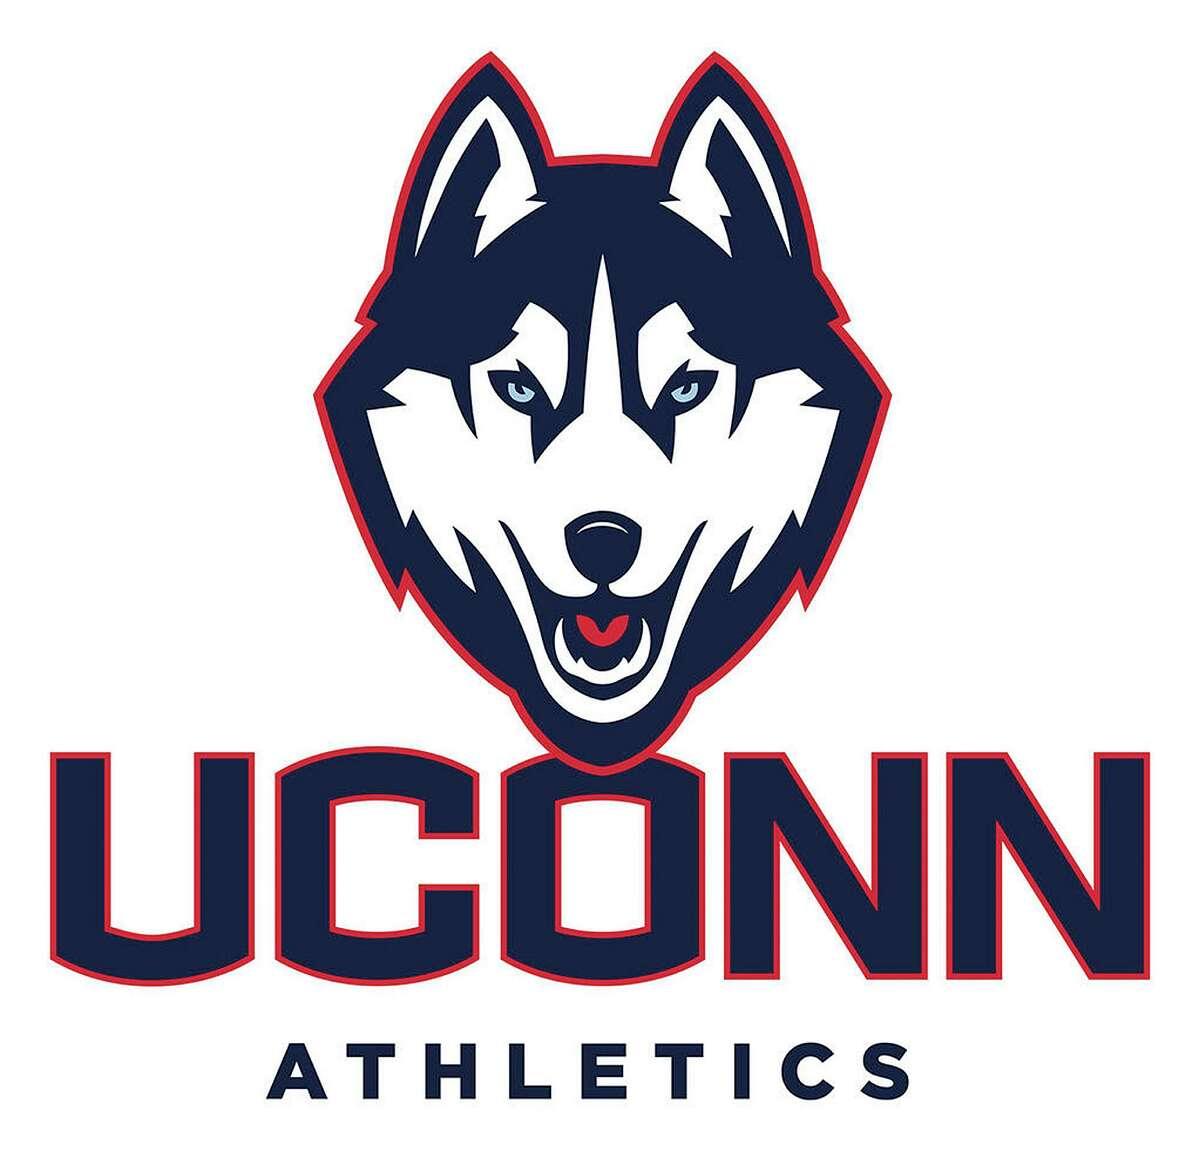 The University of Connecticut mascot logo.